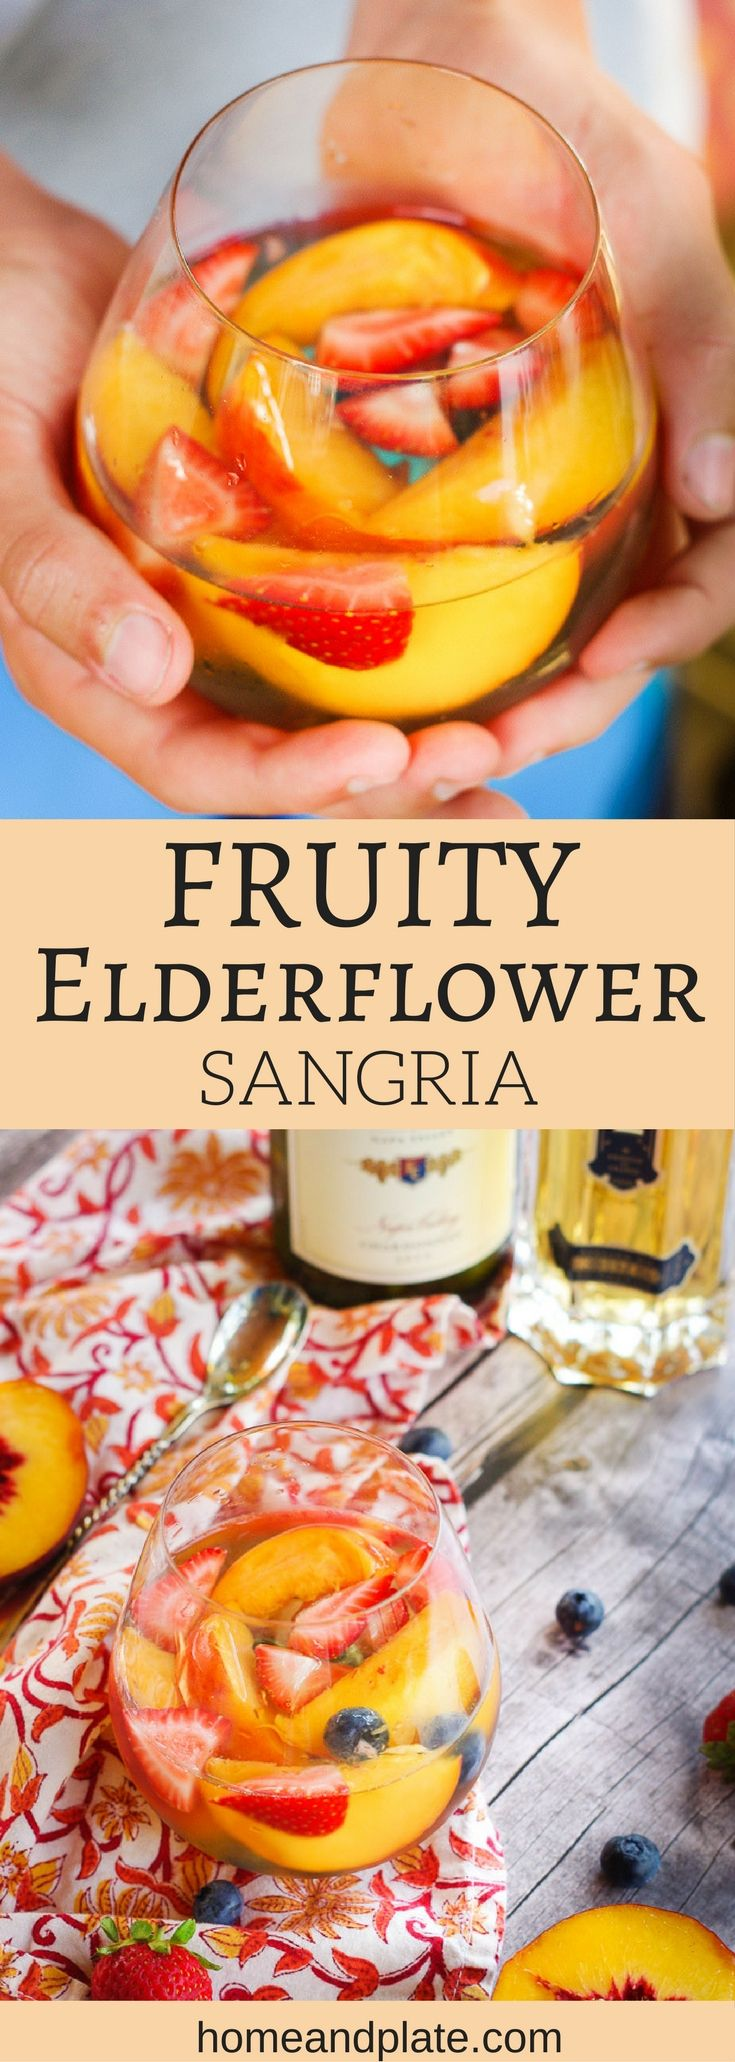 Fruity Elderflower Sangria   Summer's freshest fruits and elderflower liqueur are the stars of this fruity summer sangria spritzer.   www.homeandplate.com